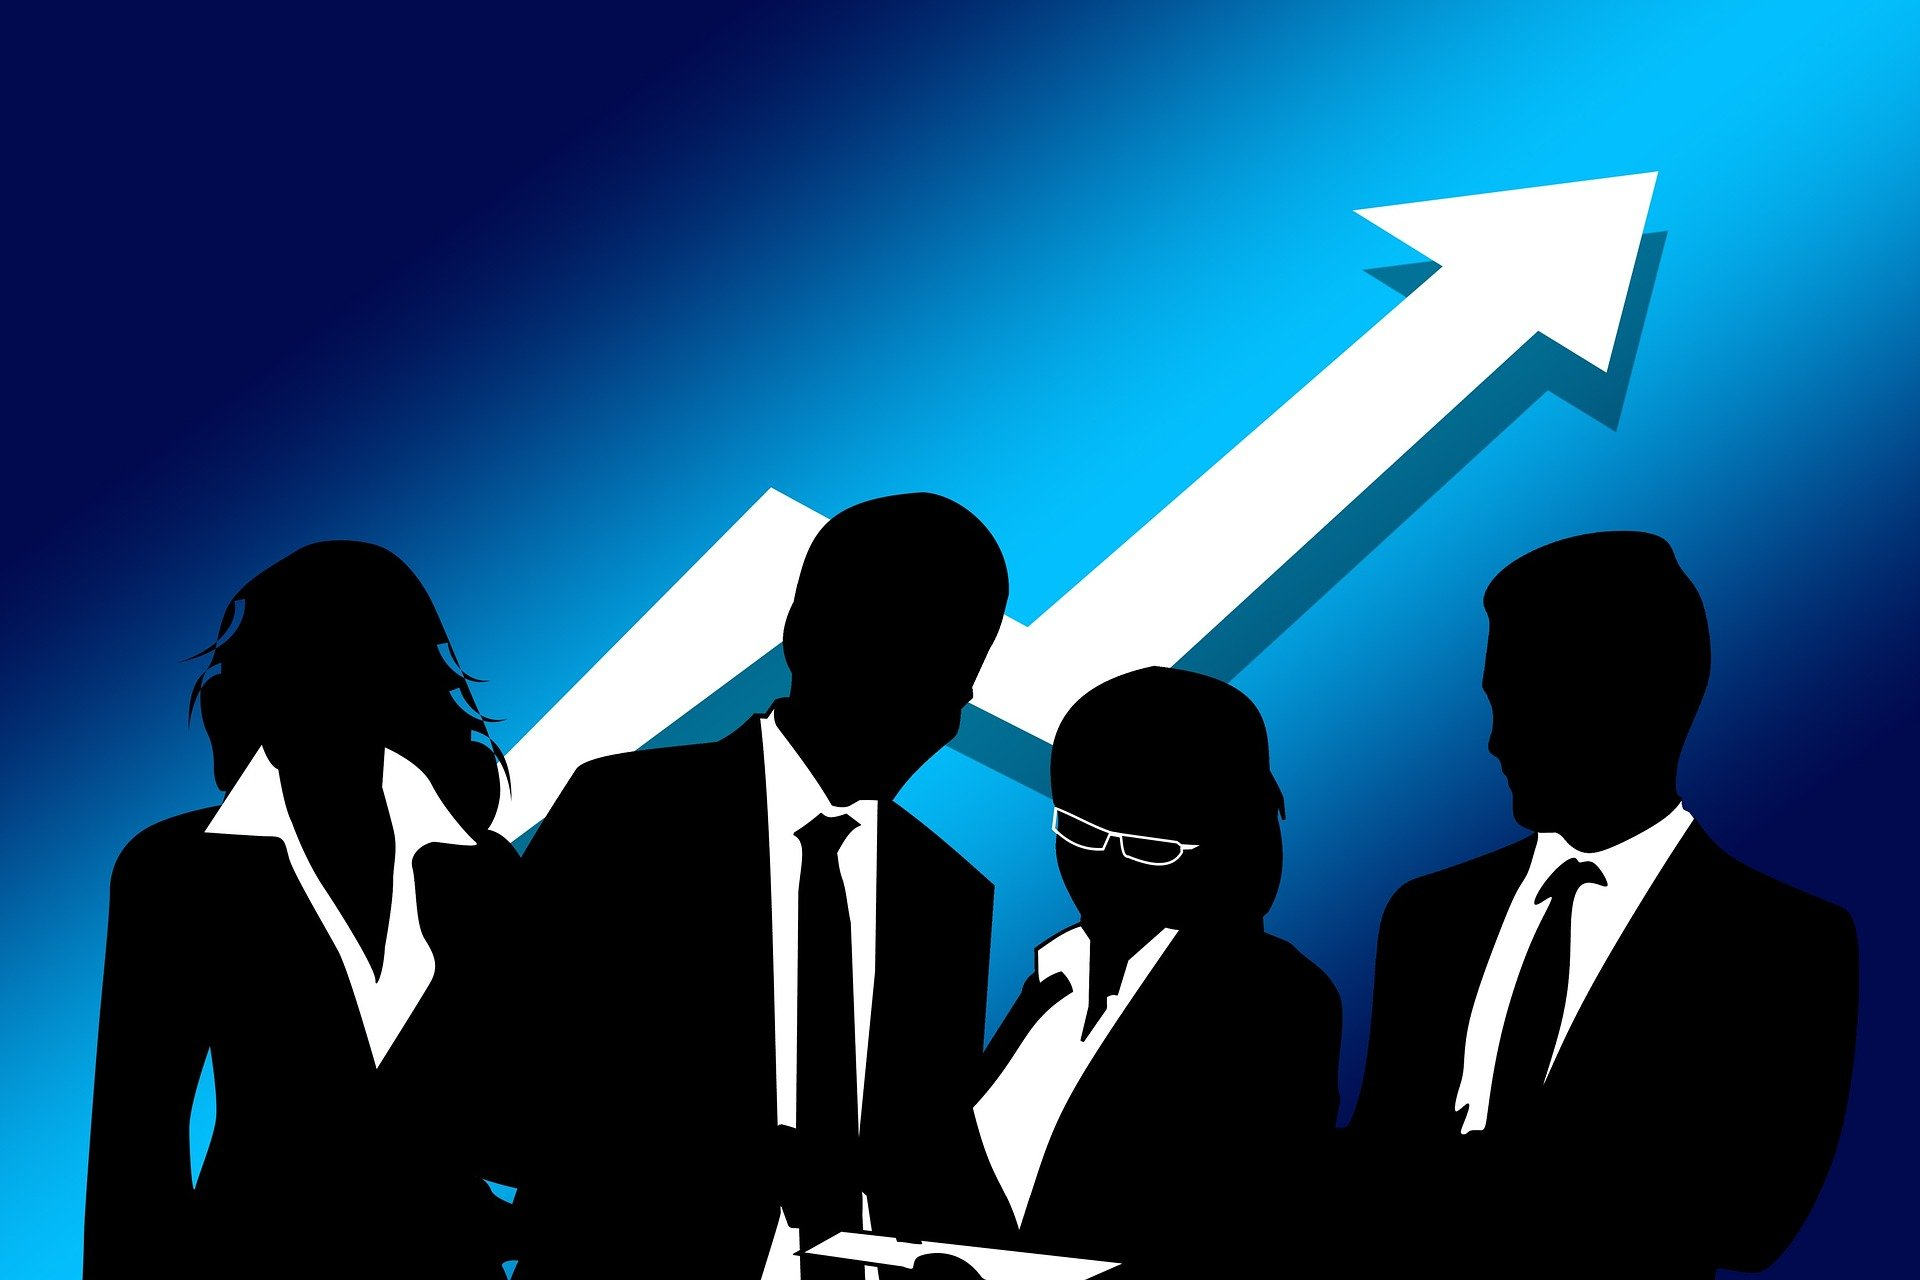 growthsuccess-1513739_1920.jpg